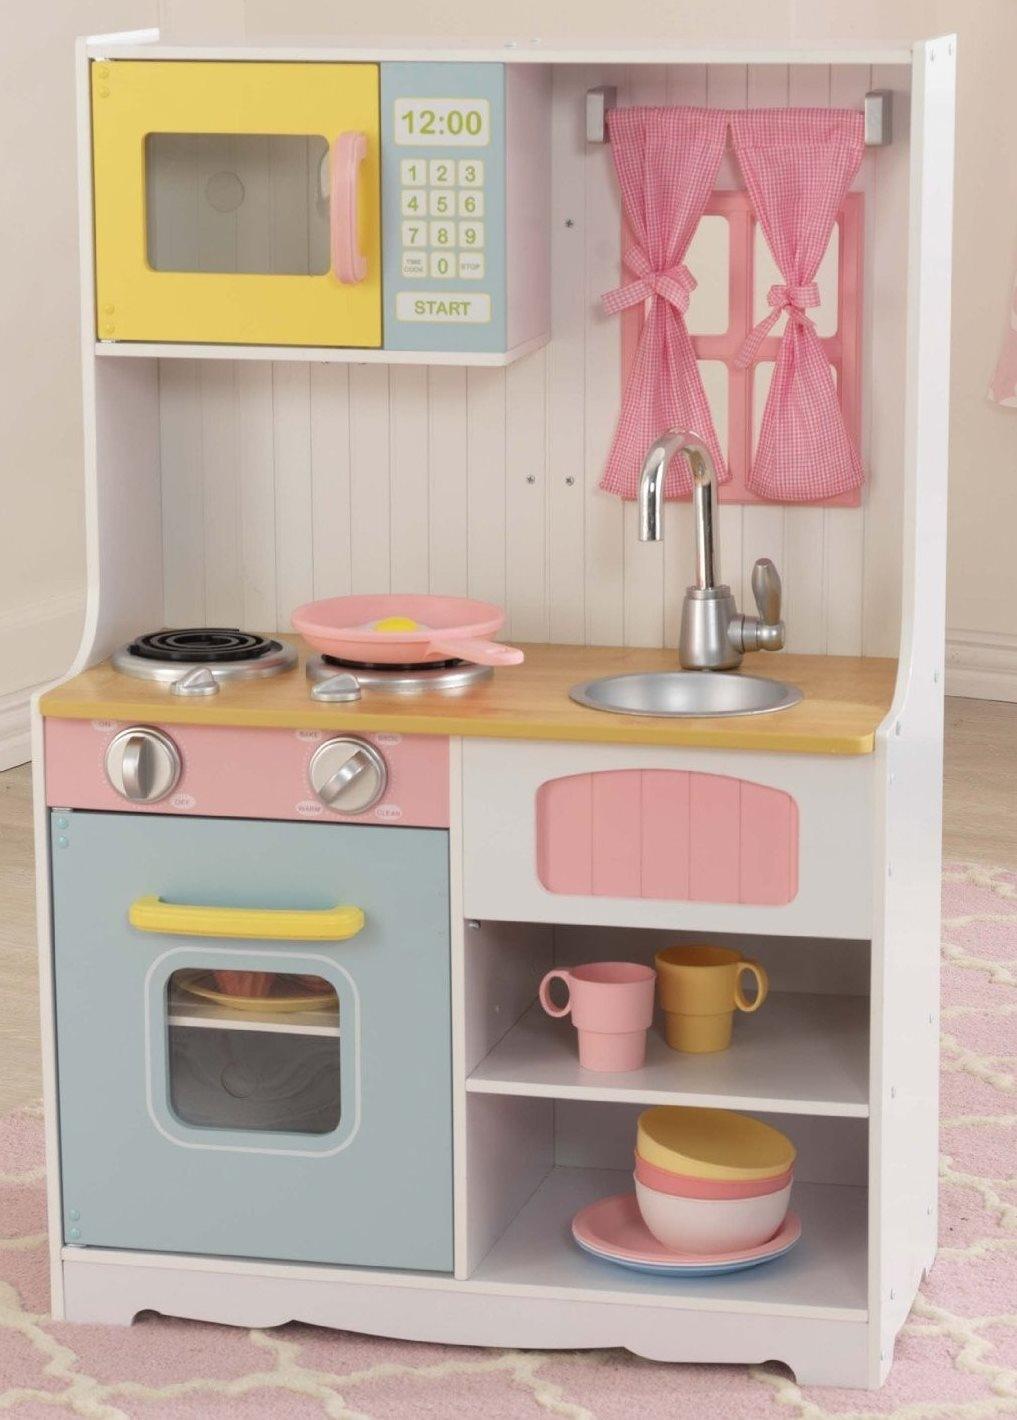 cuisine pastel country kidkraft 53354. Black Bedroom Furniture Sets. Home Design Ideas